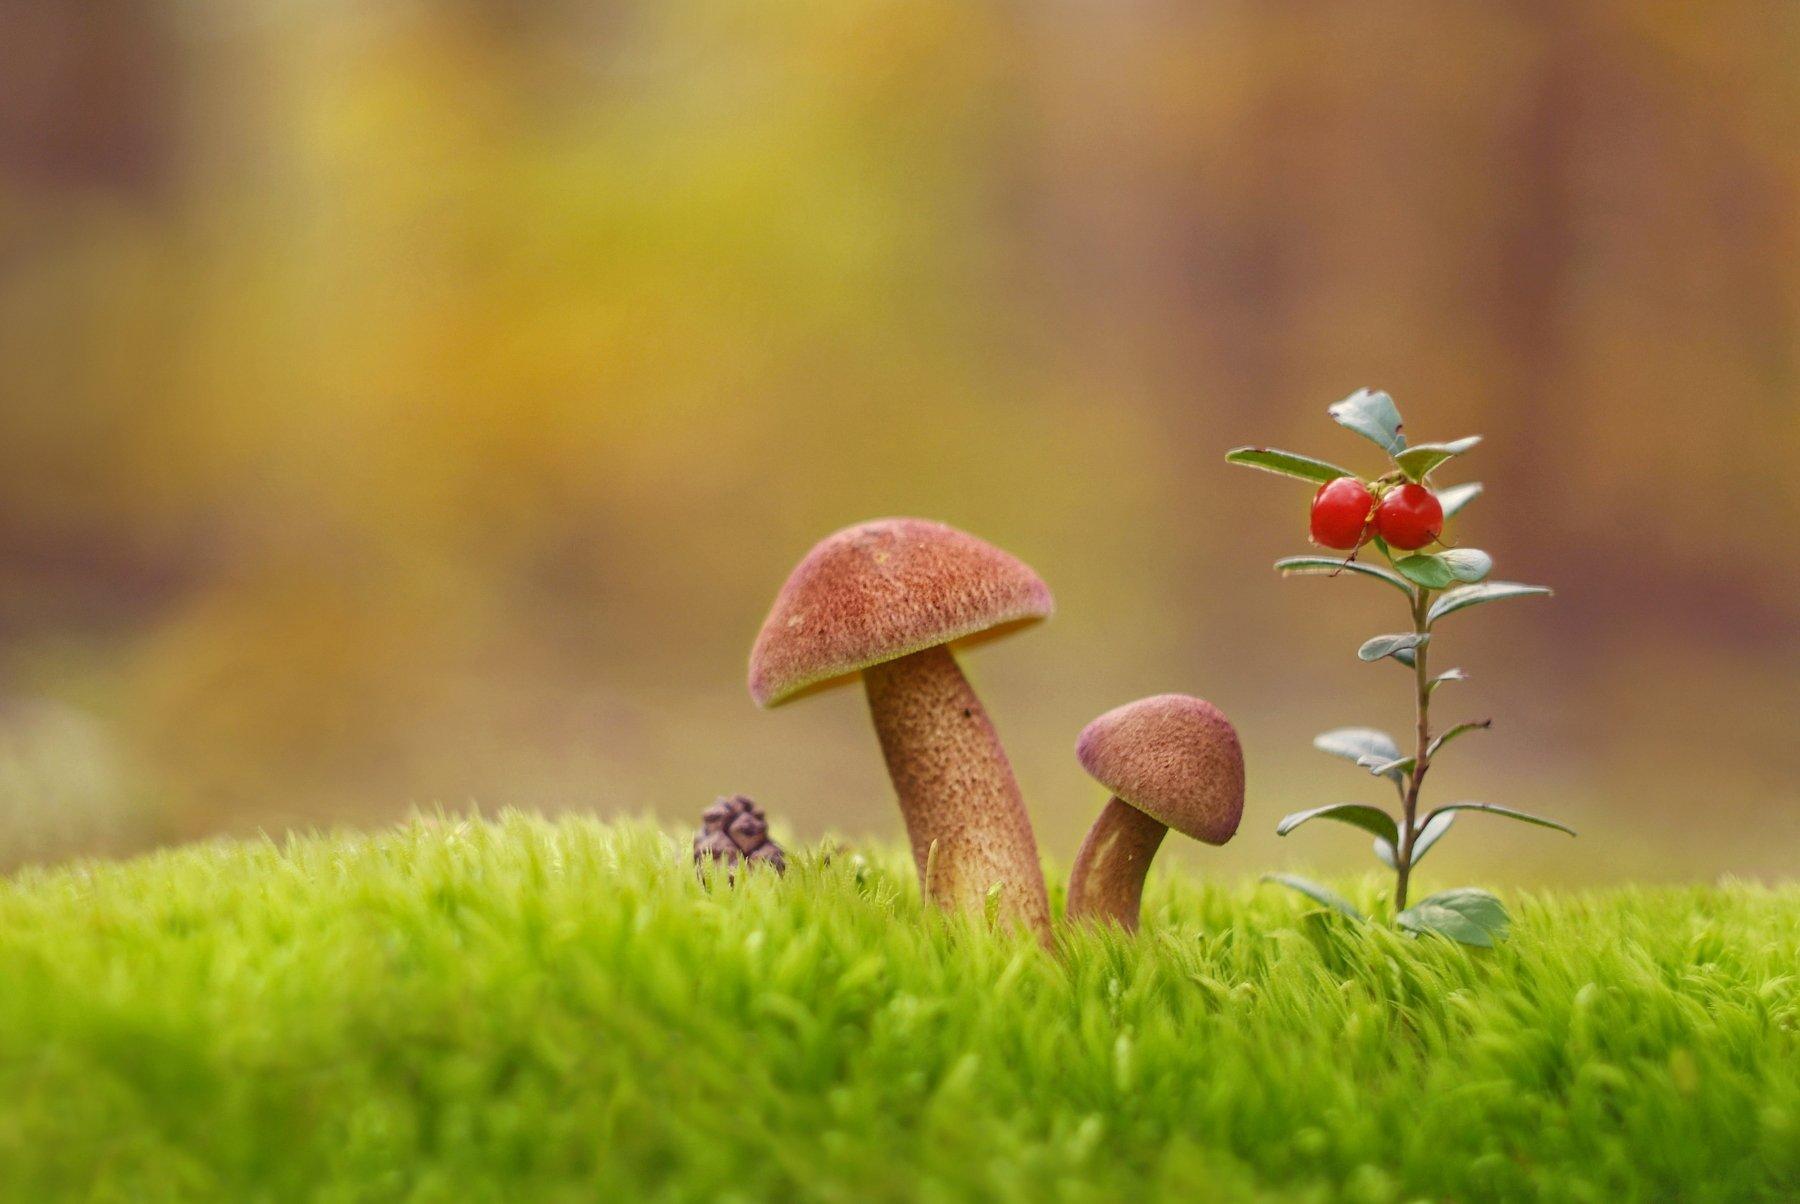 грибы, природа, гелиос, Александр Гвоздь